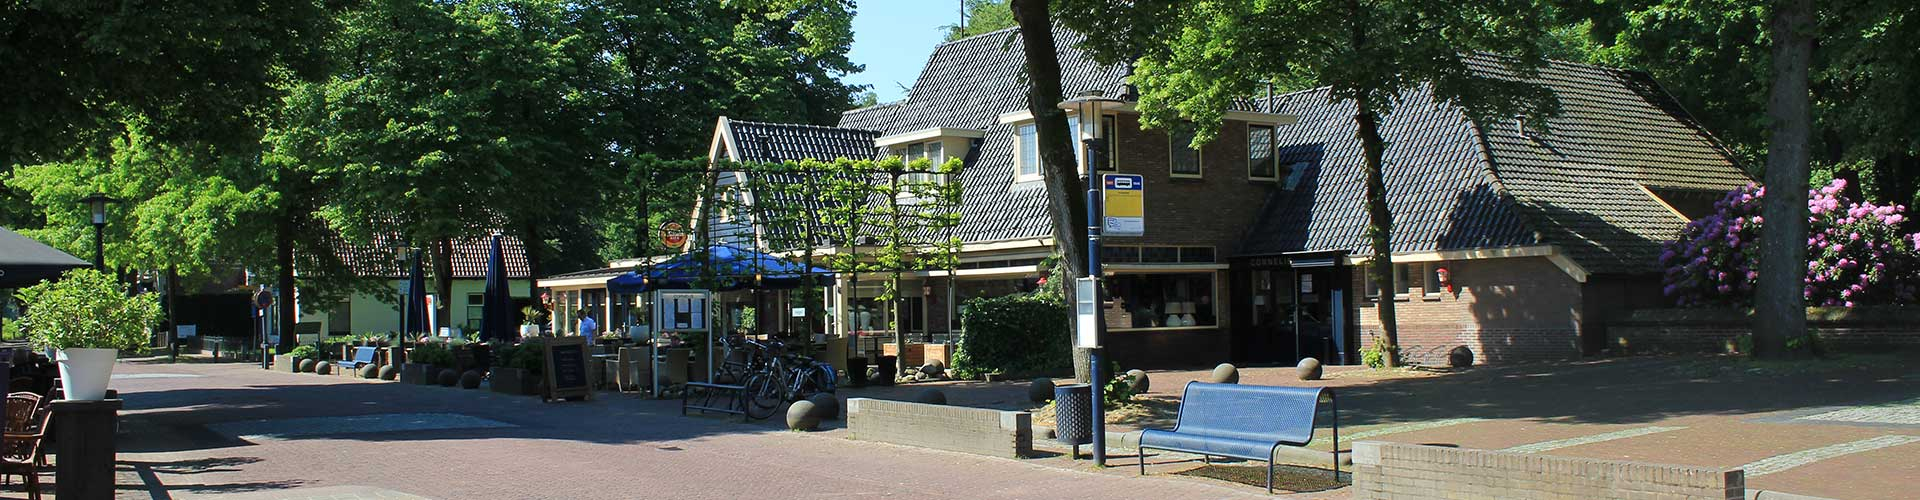 Restaurant-Zalencentrum Cornelis Dalen